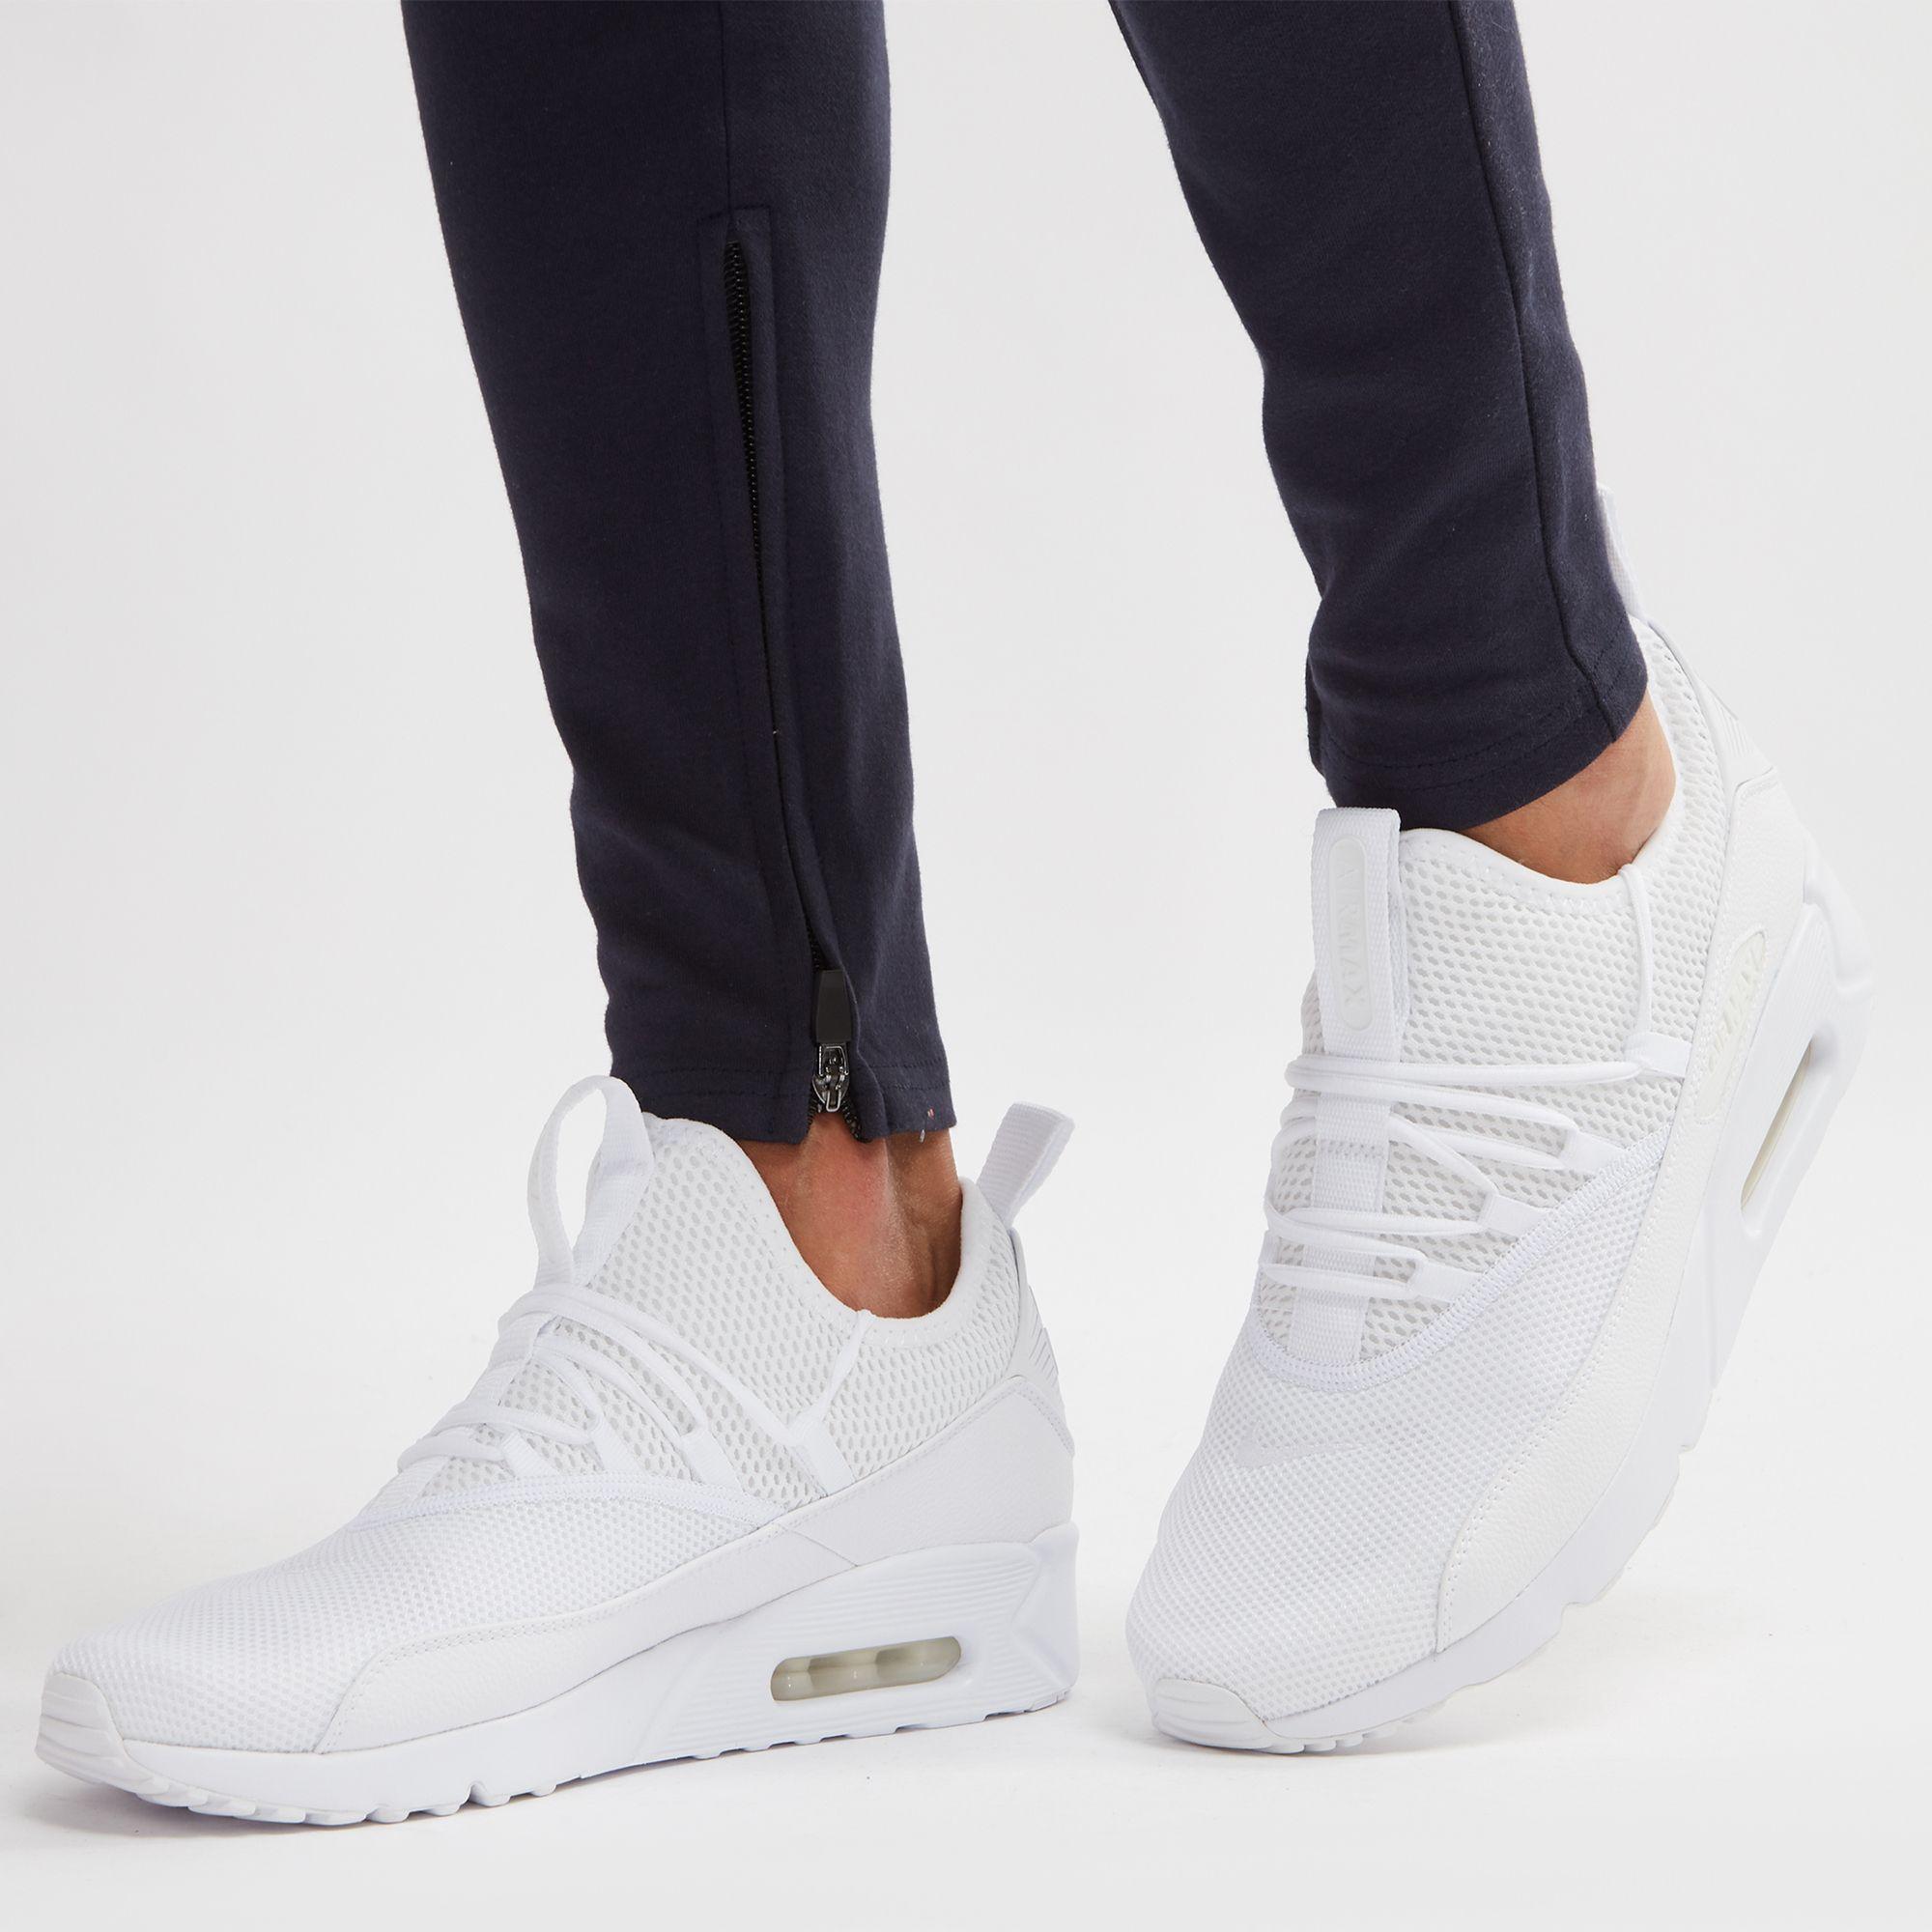 timeless design 2e735 03995 Nike Air Max 90 EZ Shoe